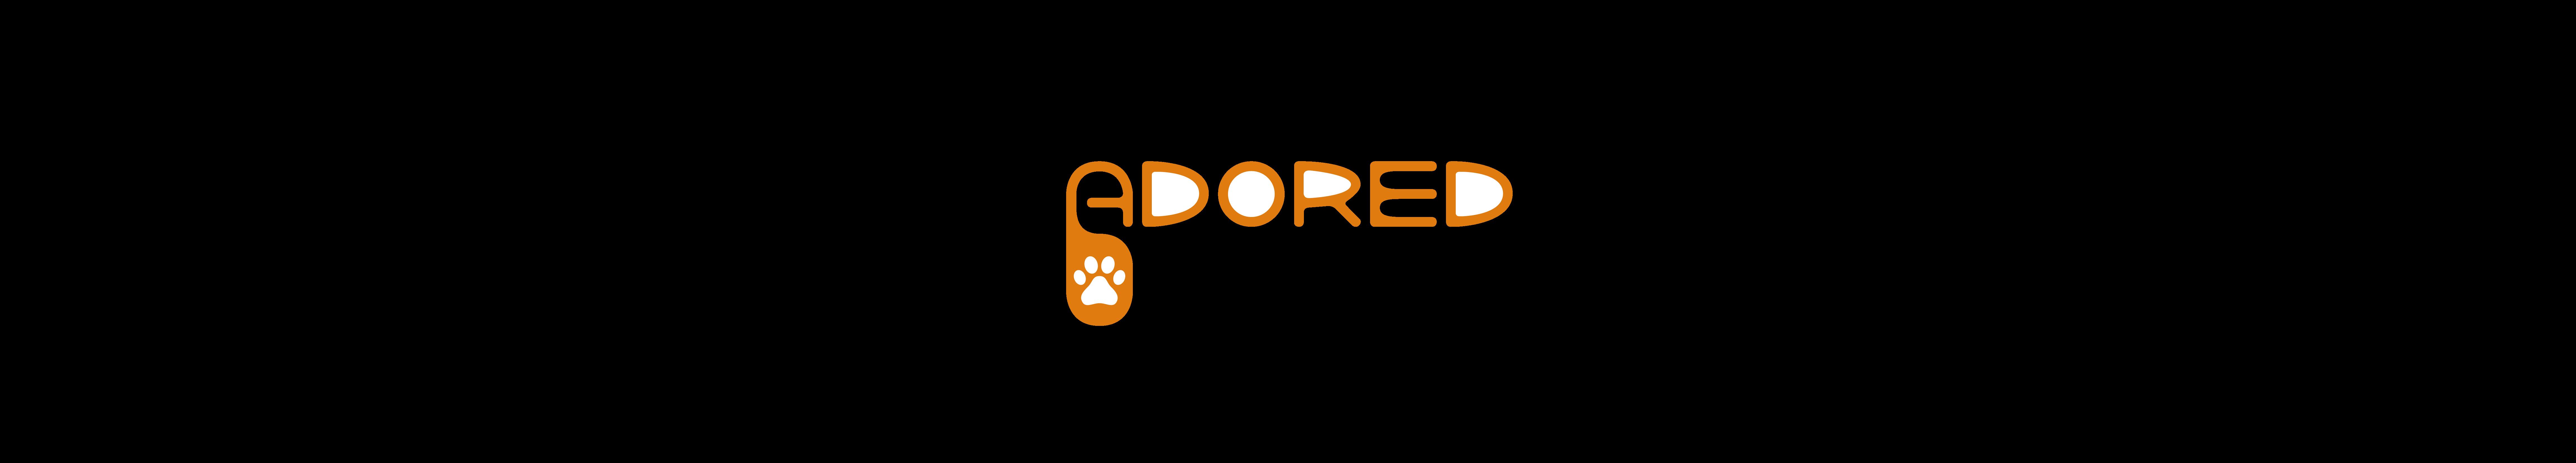 Adored_01